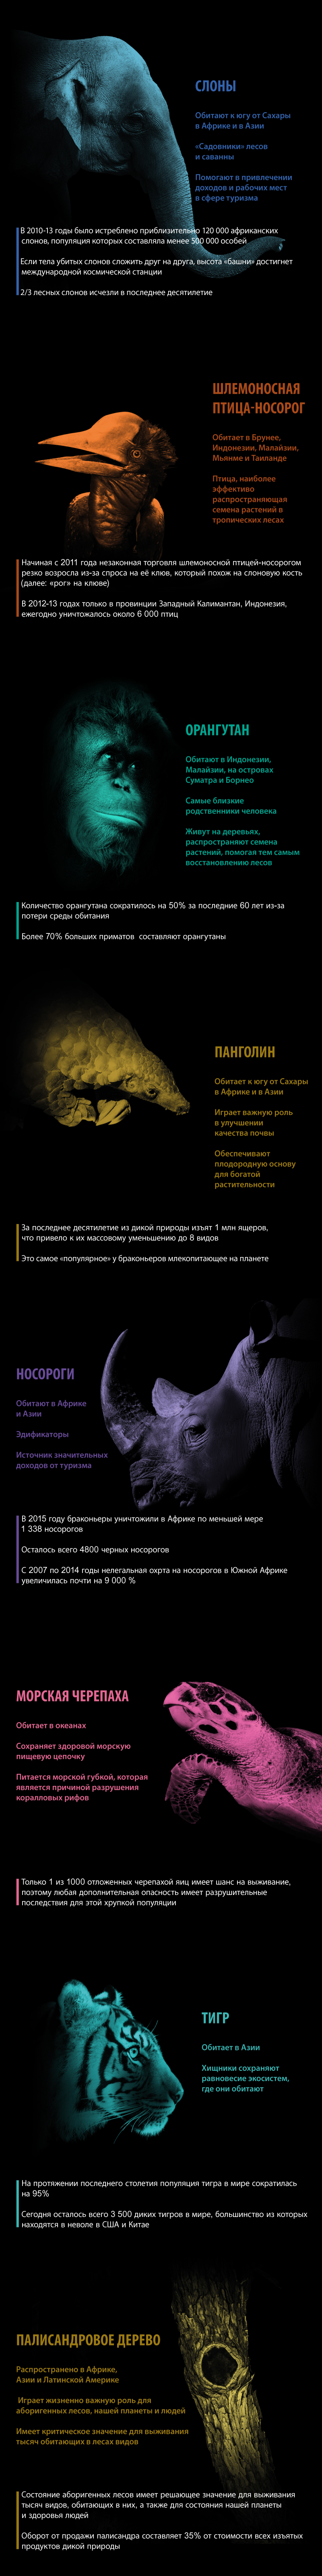 ITW_infog2_ru.jpg